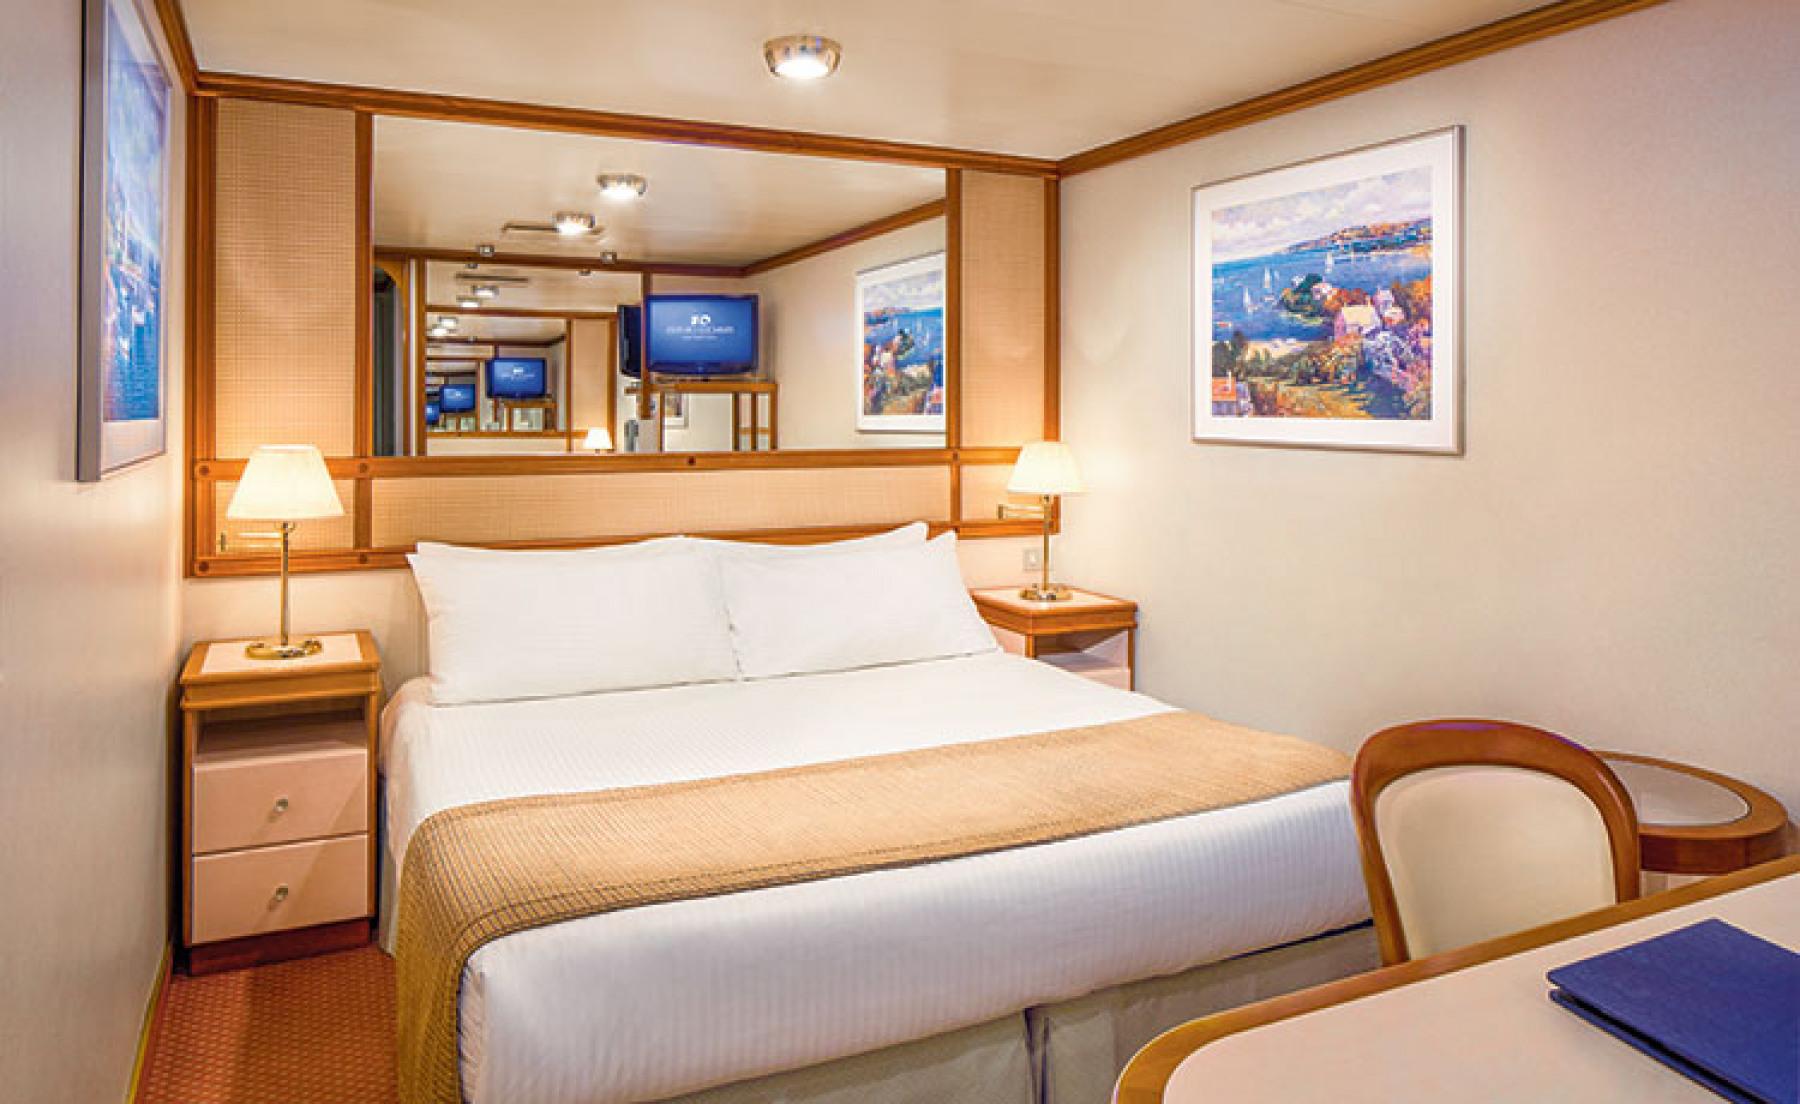 Princess Cruises Ruby Princess Accommodation Interior.jpg